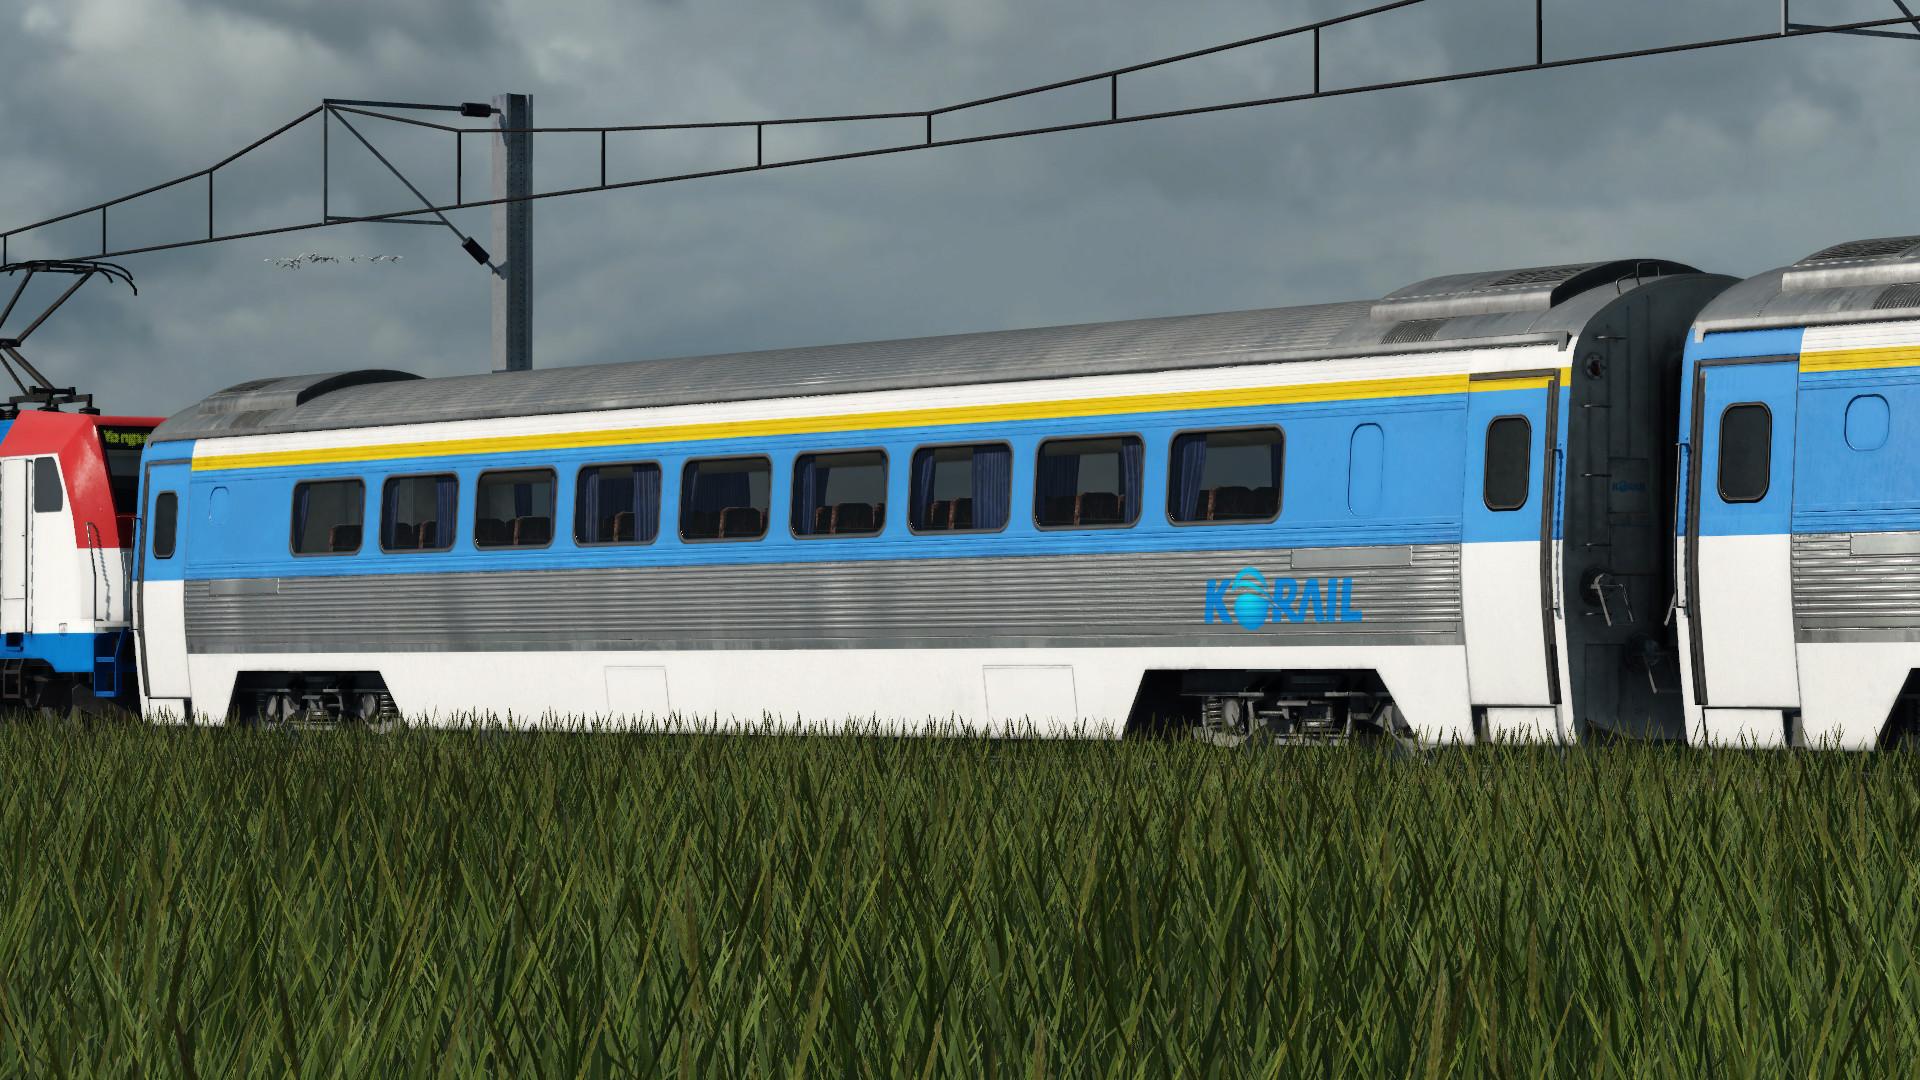 Transport Fever 2 - Korail Saemaul Express Wagon Addon